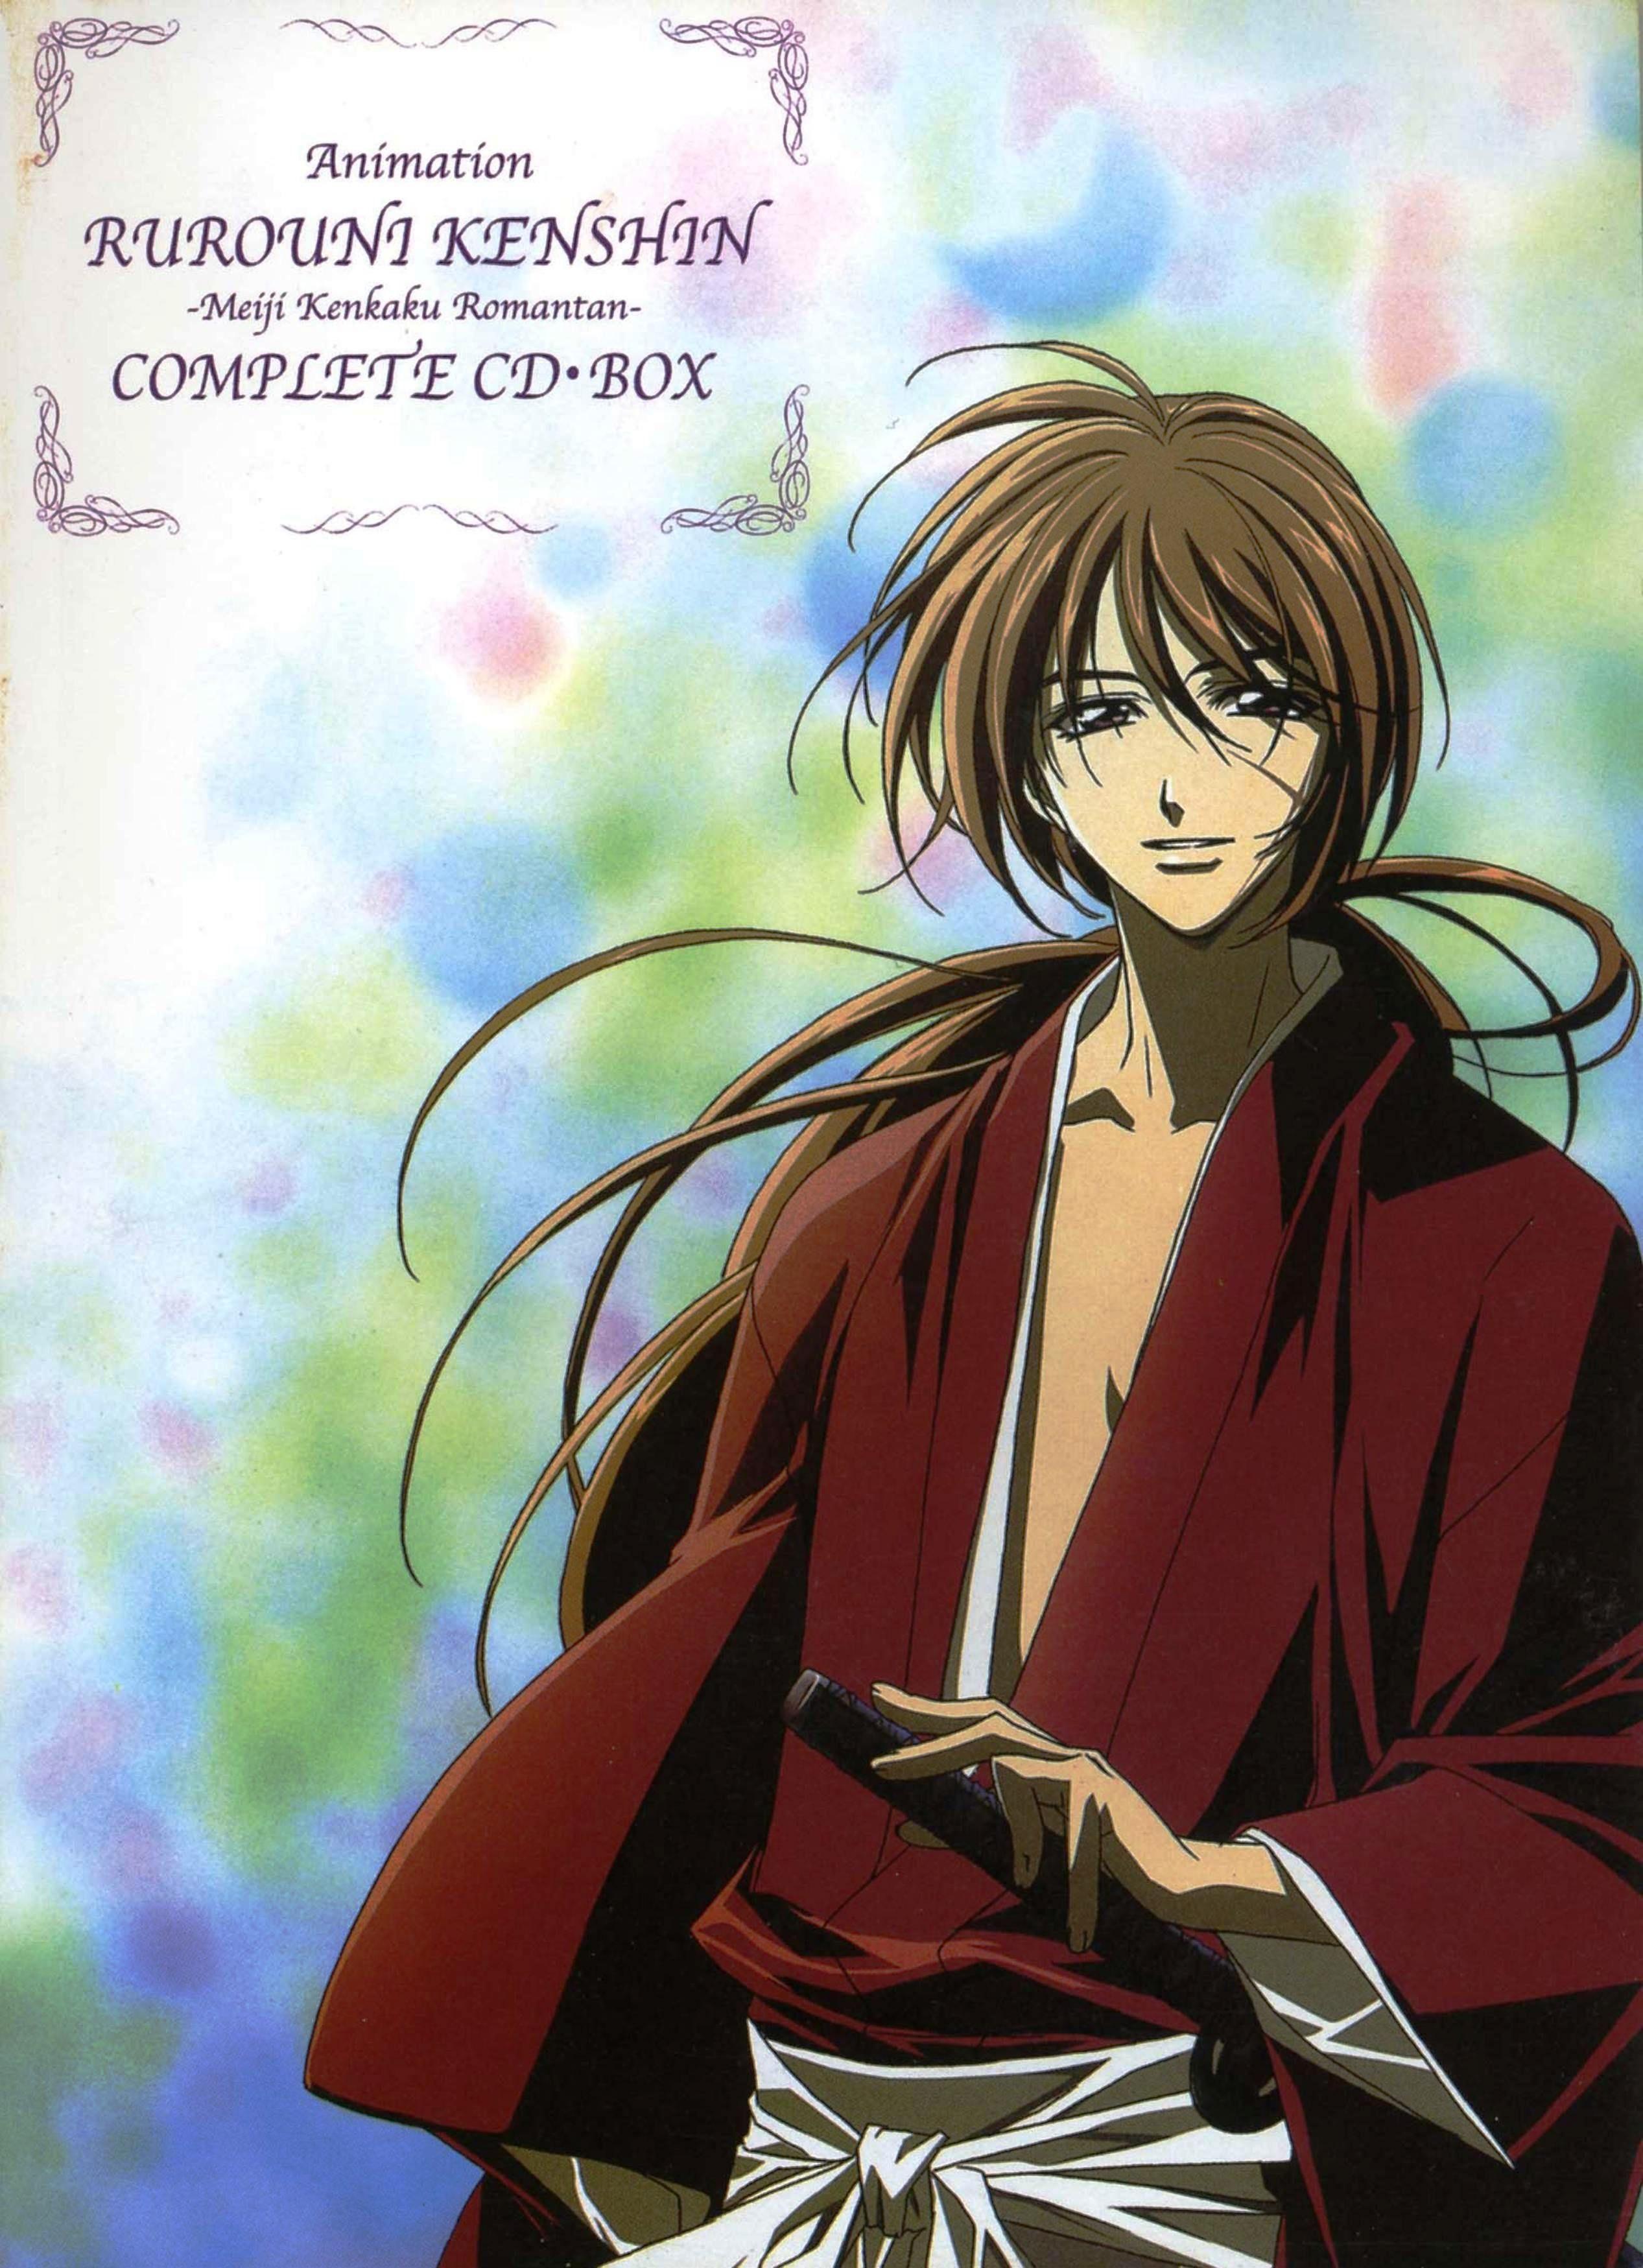 Pinterest Rurouni kenshin, Kenshin anime, Anime